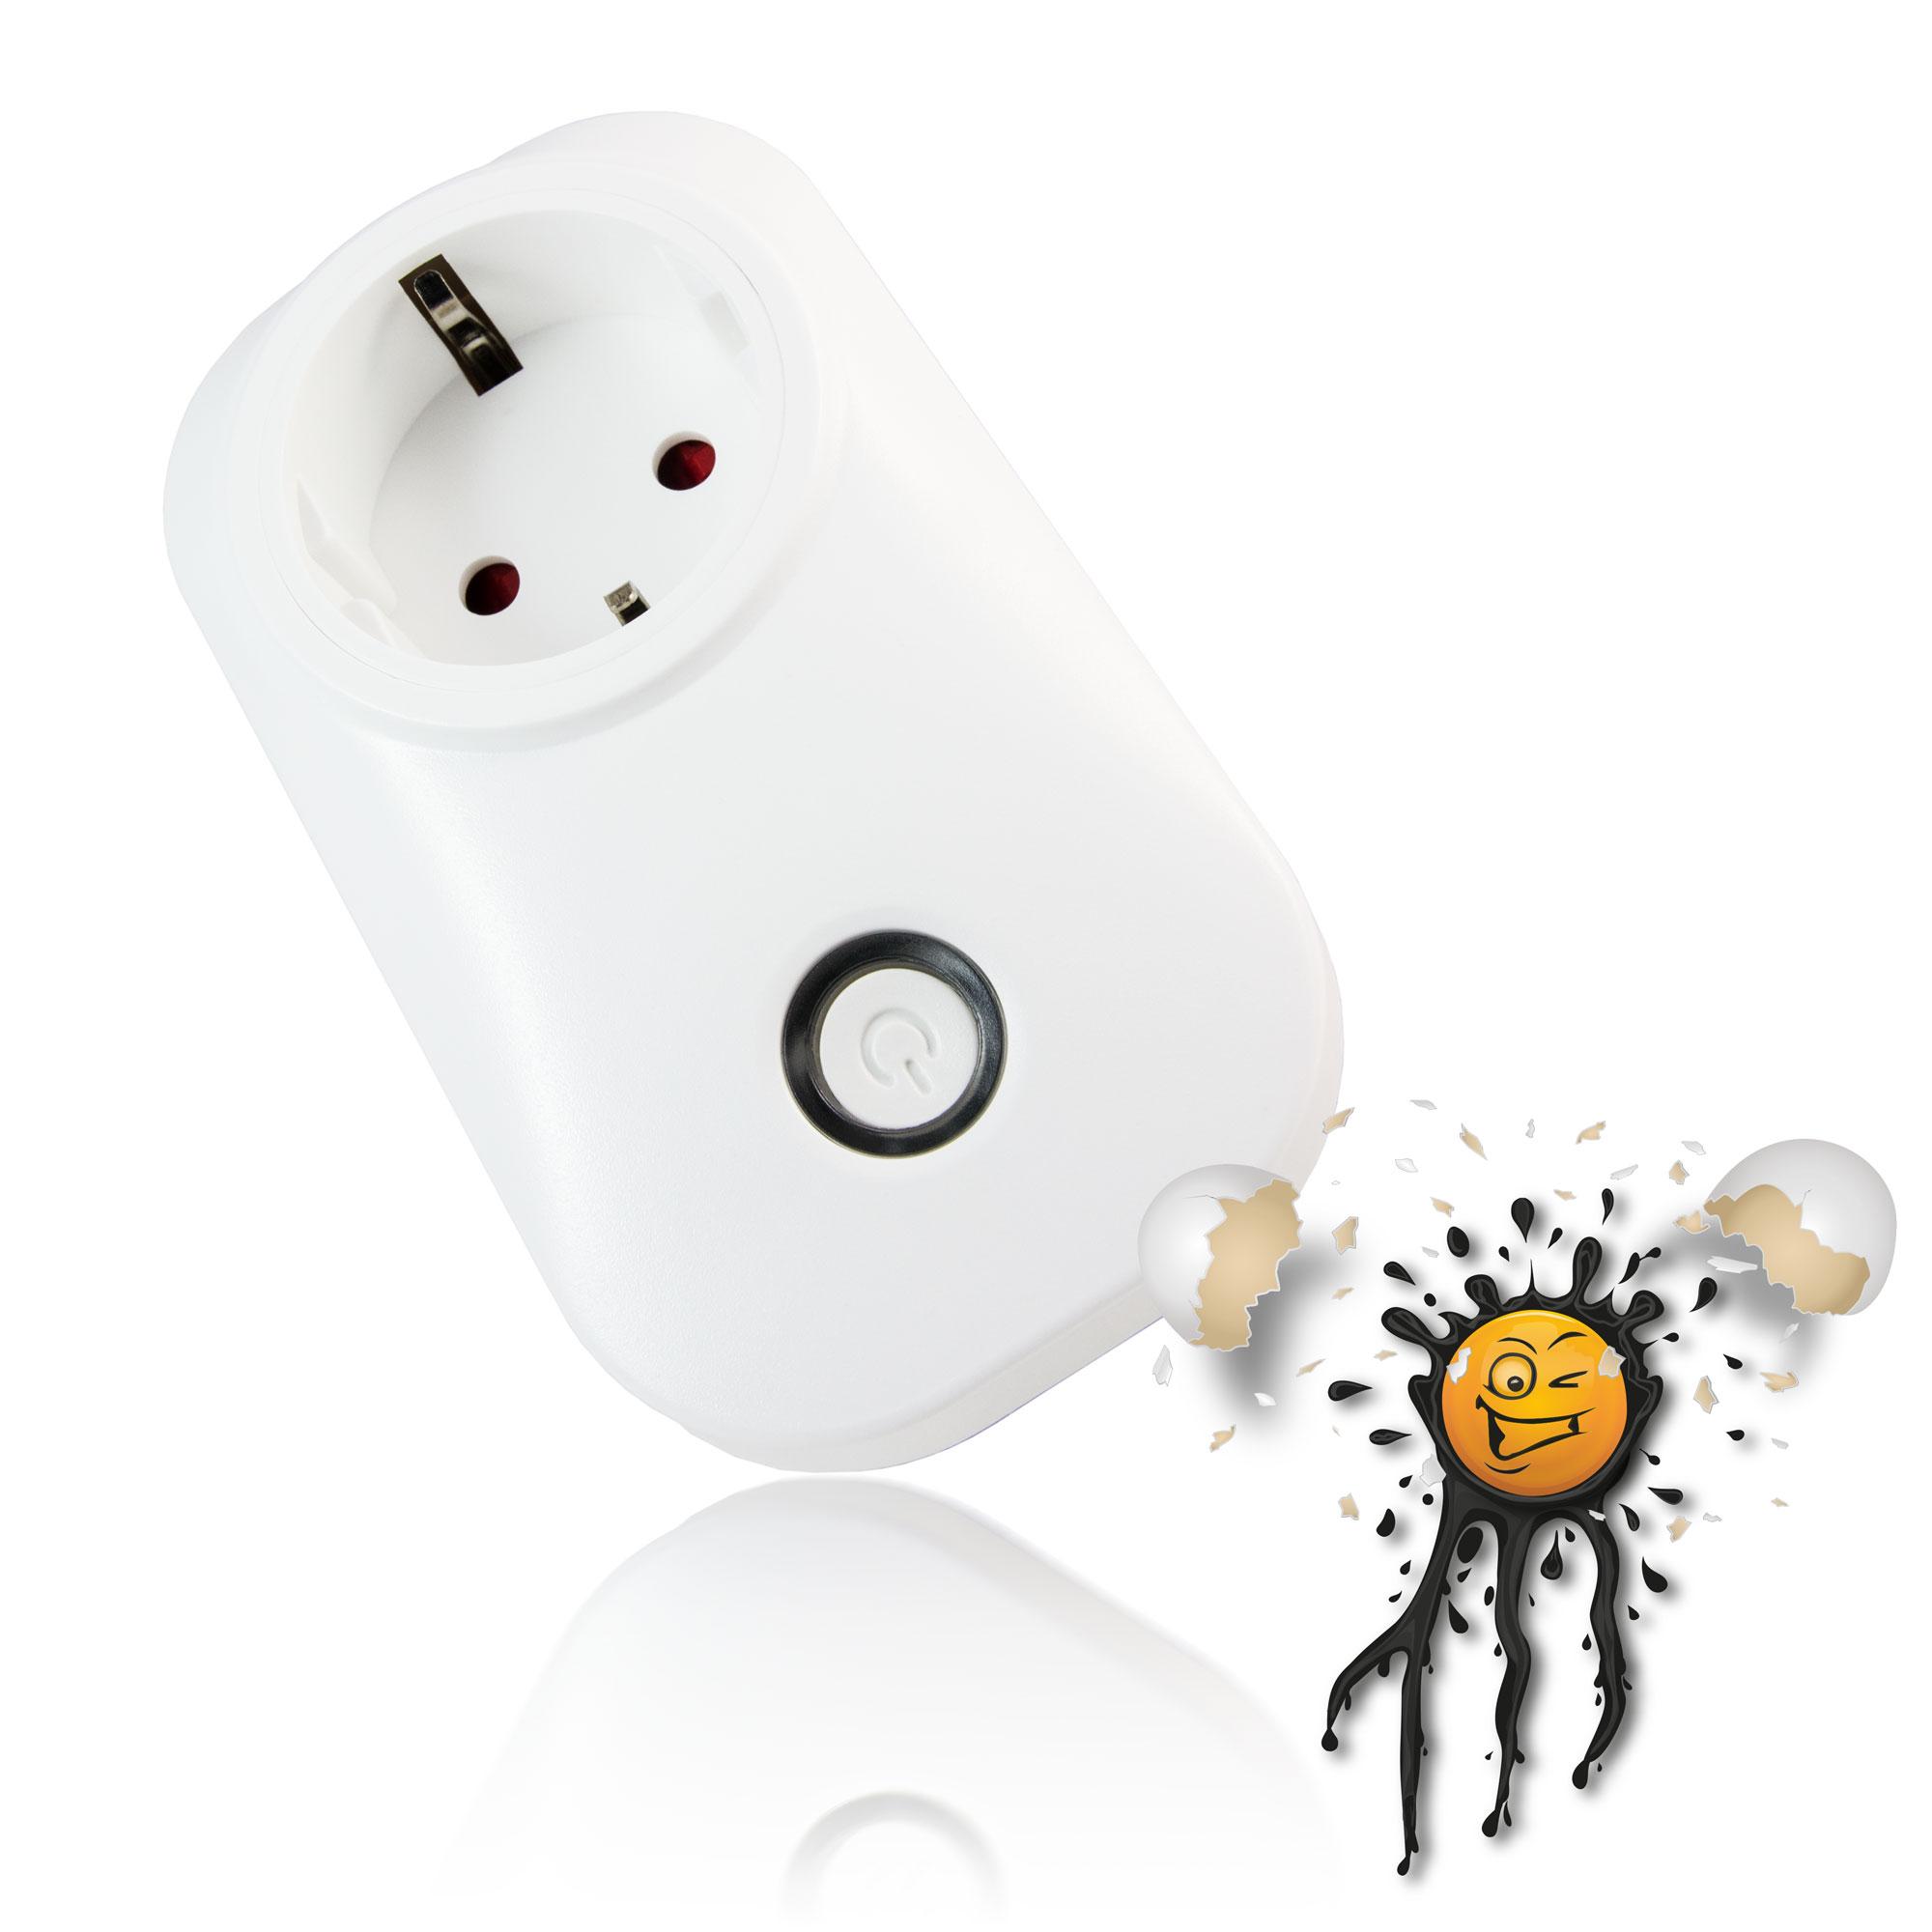 Sonoff S20 smart socket